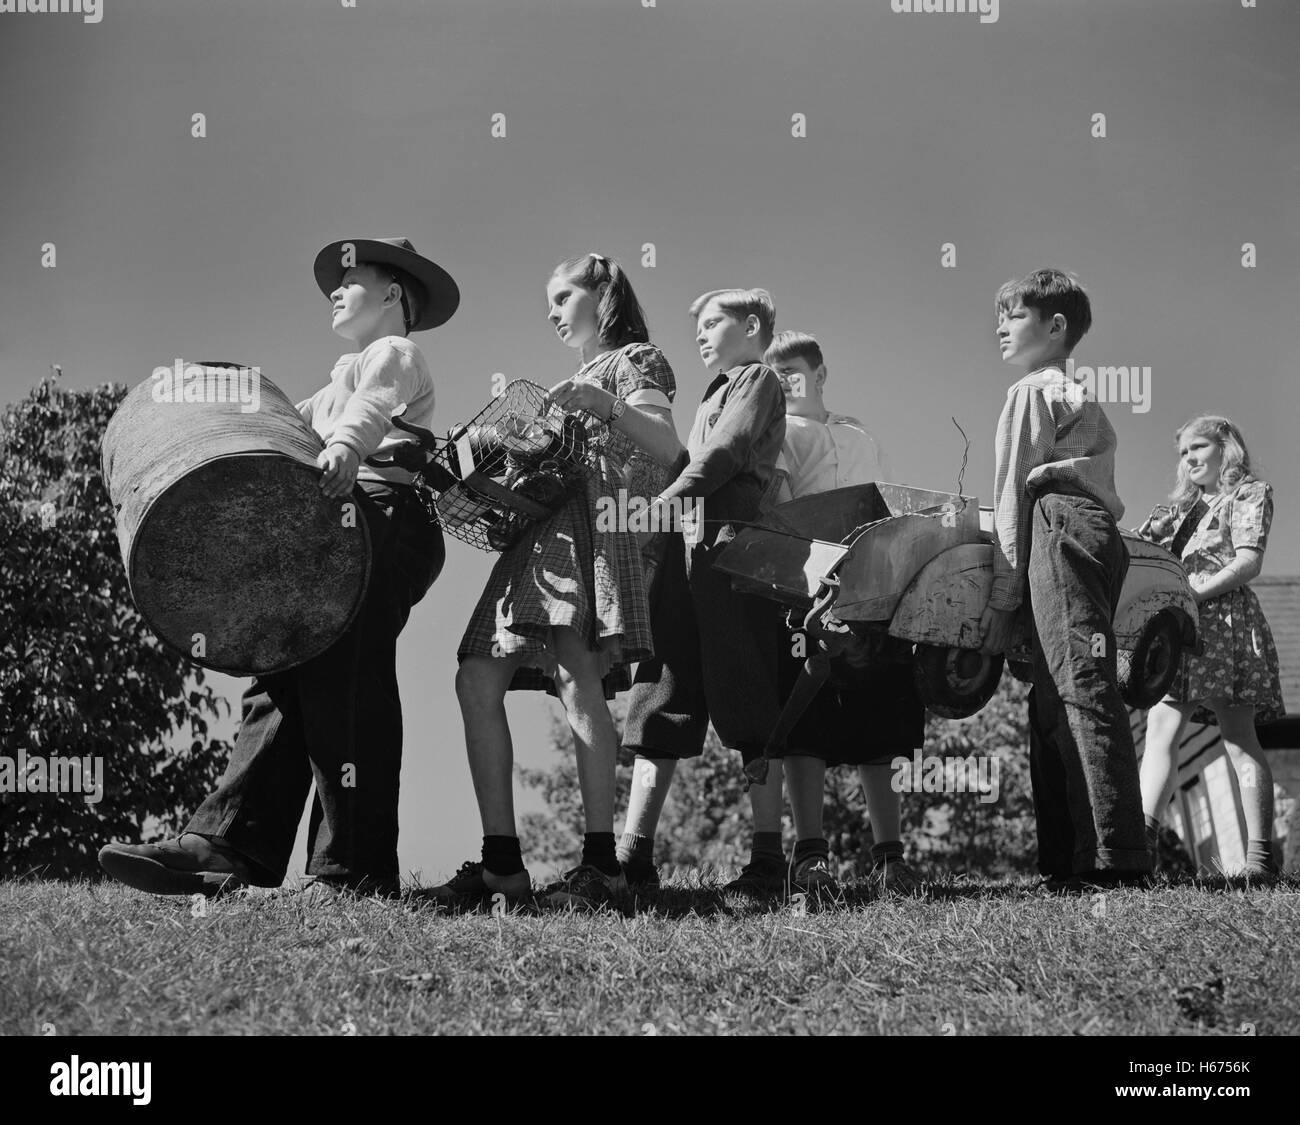 Schoolchildren Contributing to War Effort by Collecting Scrap Metal, Roanoke, Virginia, USA, Valentino Sarra, Office - Stock Image